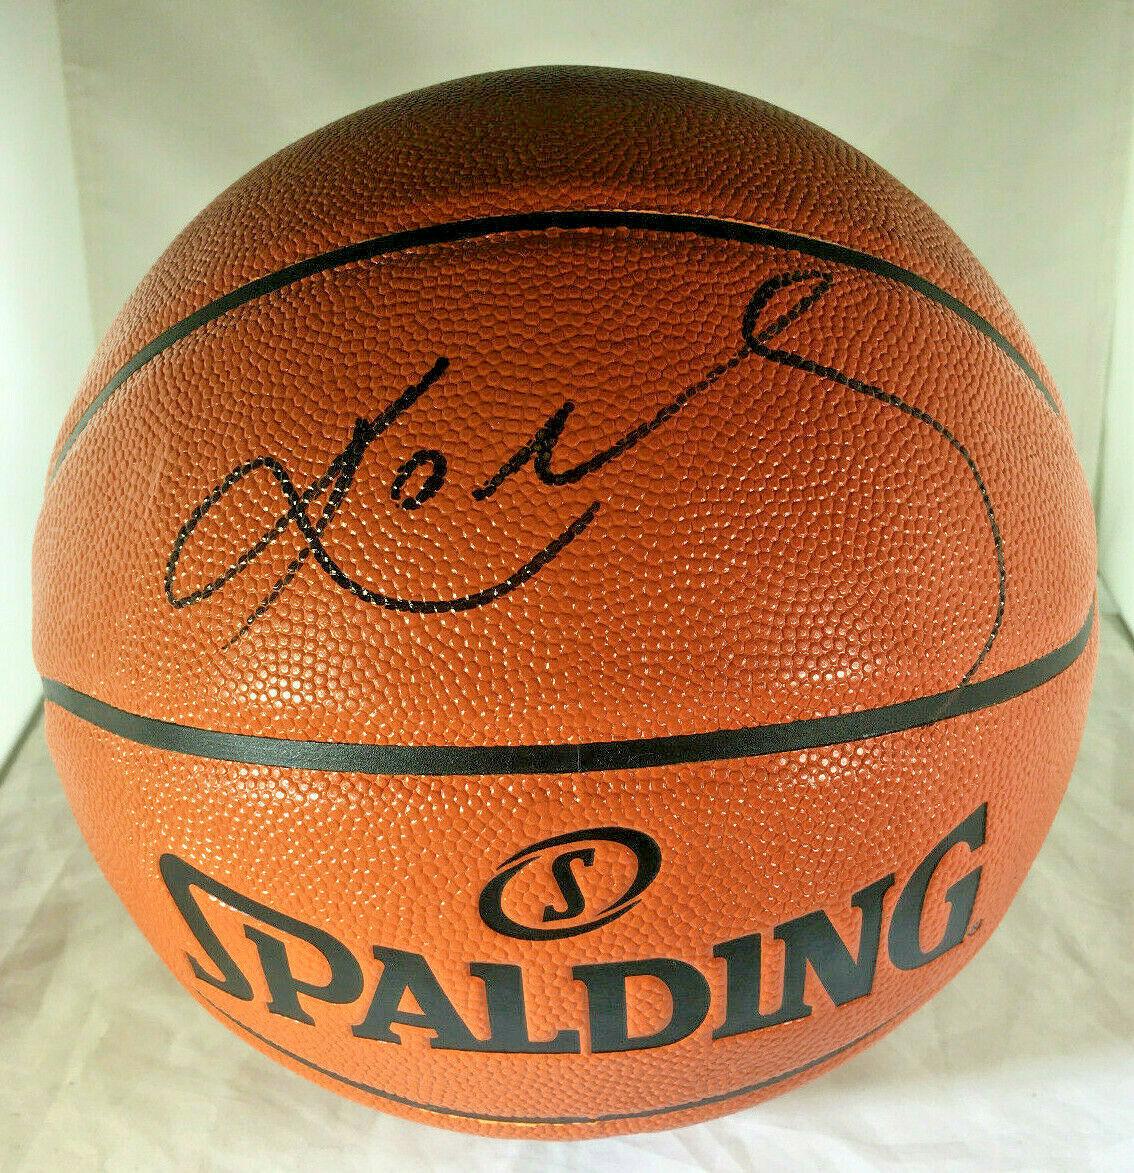 KOBE BRYANT / NBA HALL OF FAME / AUTOGRAPHED FULL SIZE NBA BASKETBALL / COA